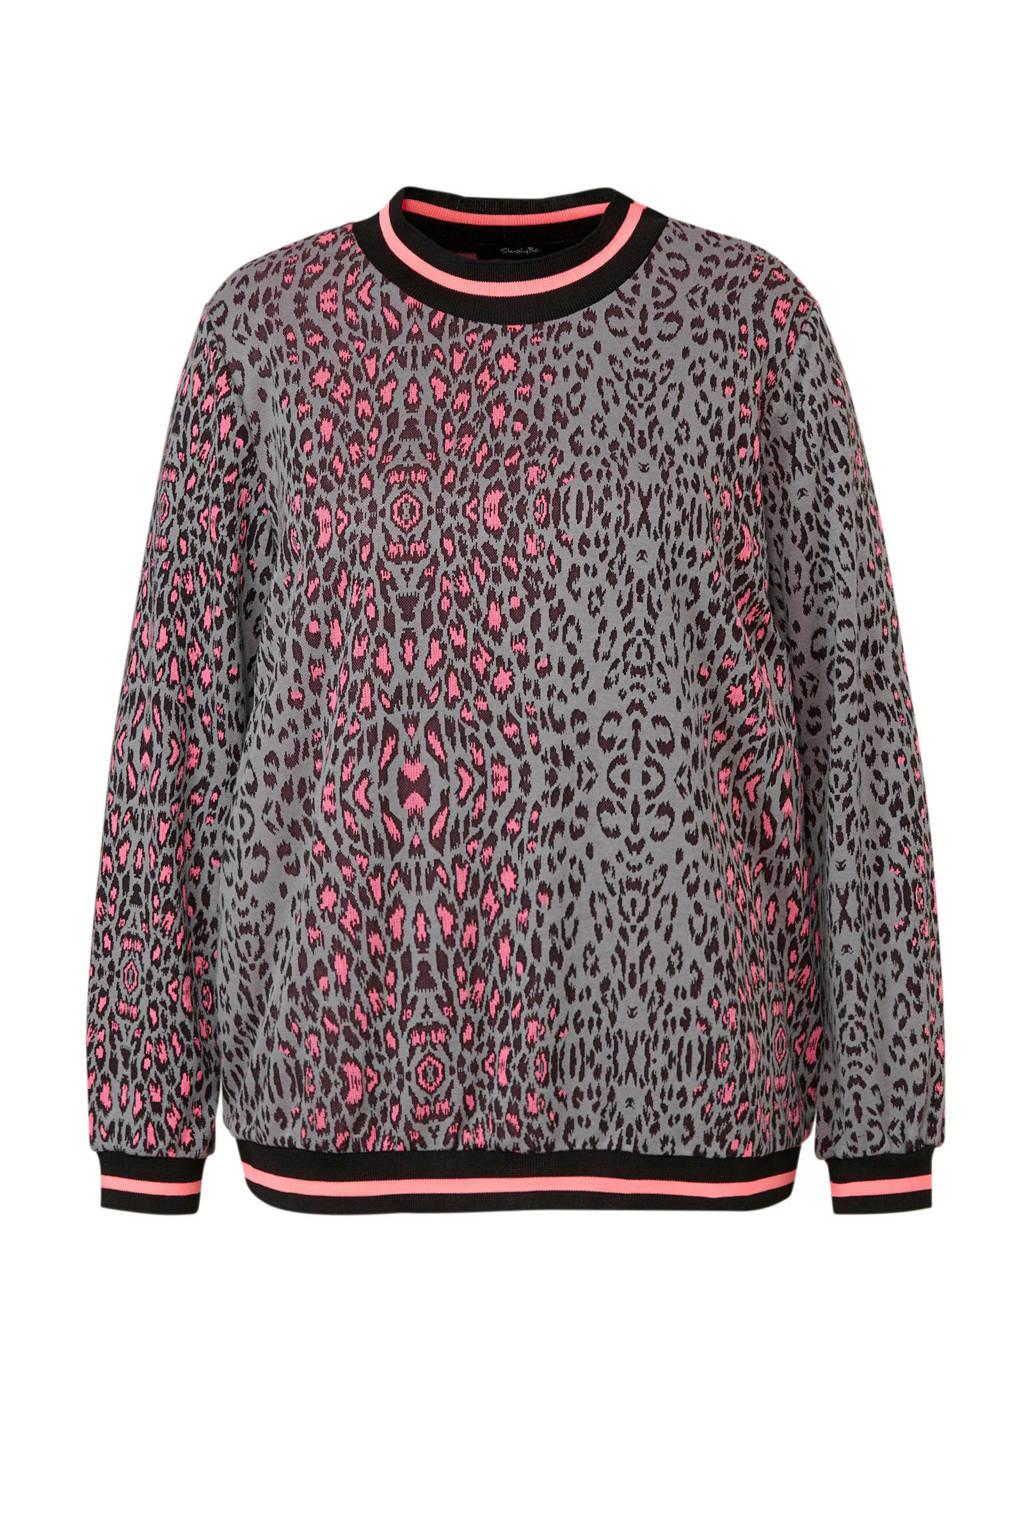 Simply Be trui met panterprint, Grijs/roze/zwart